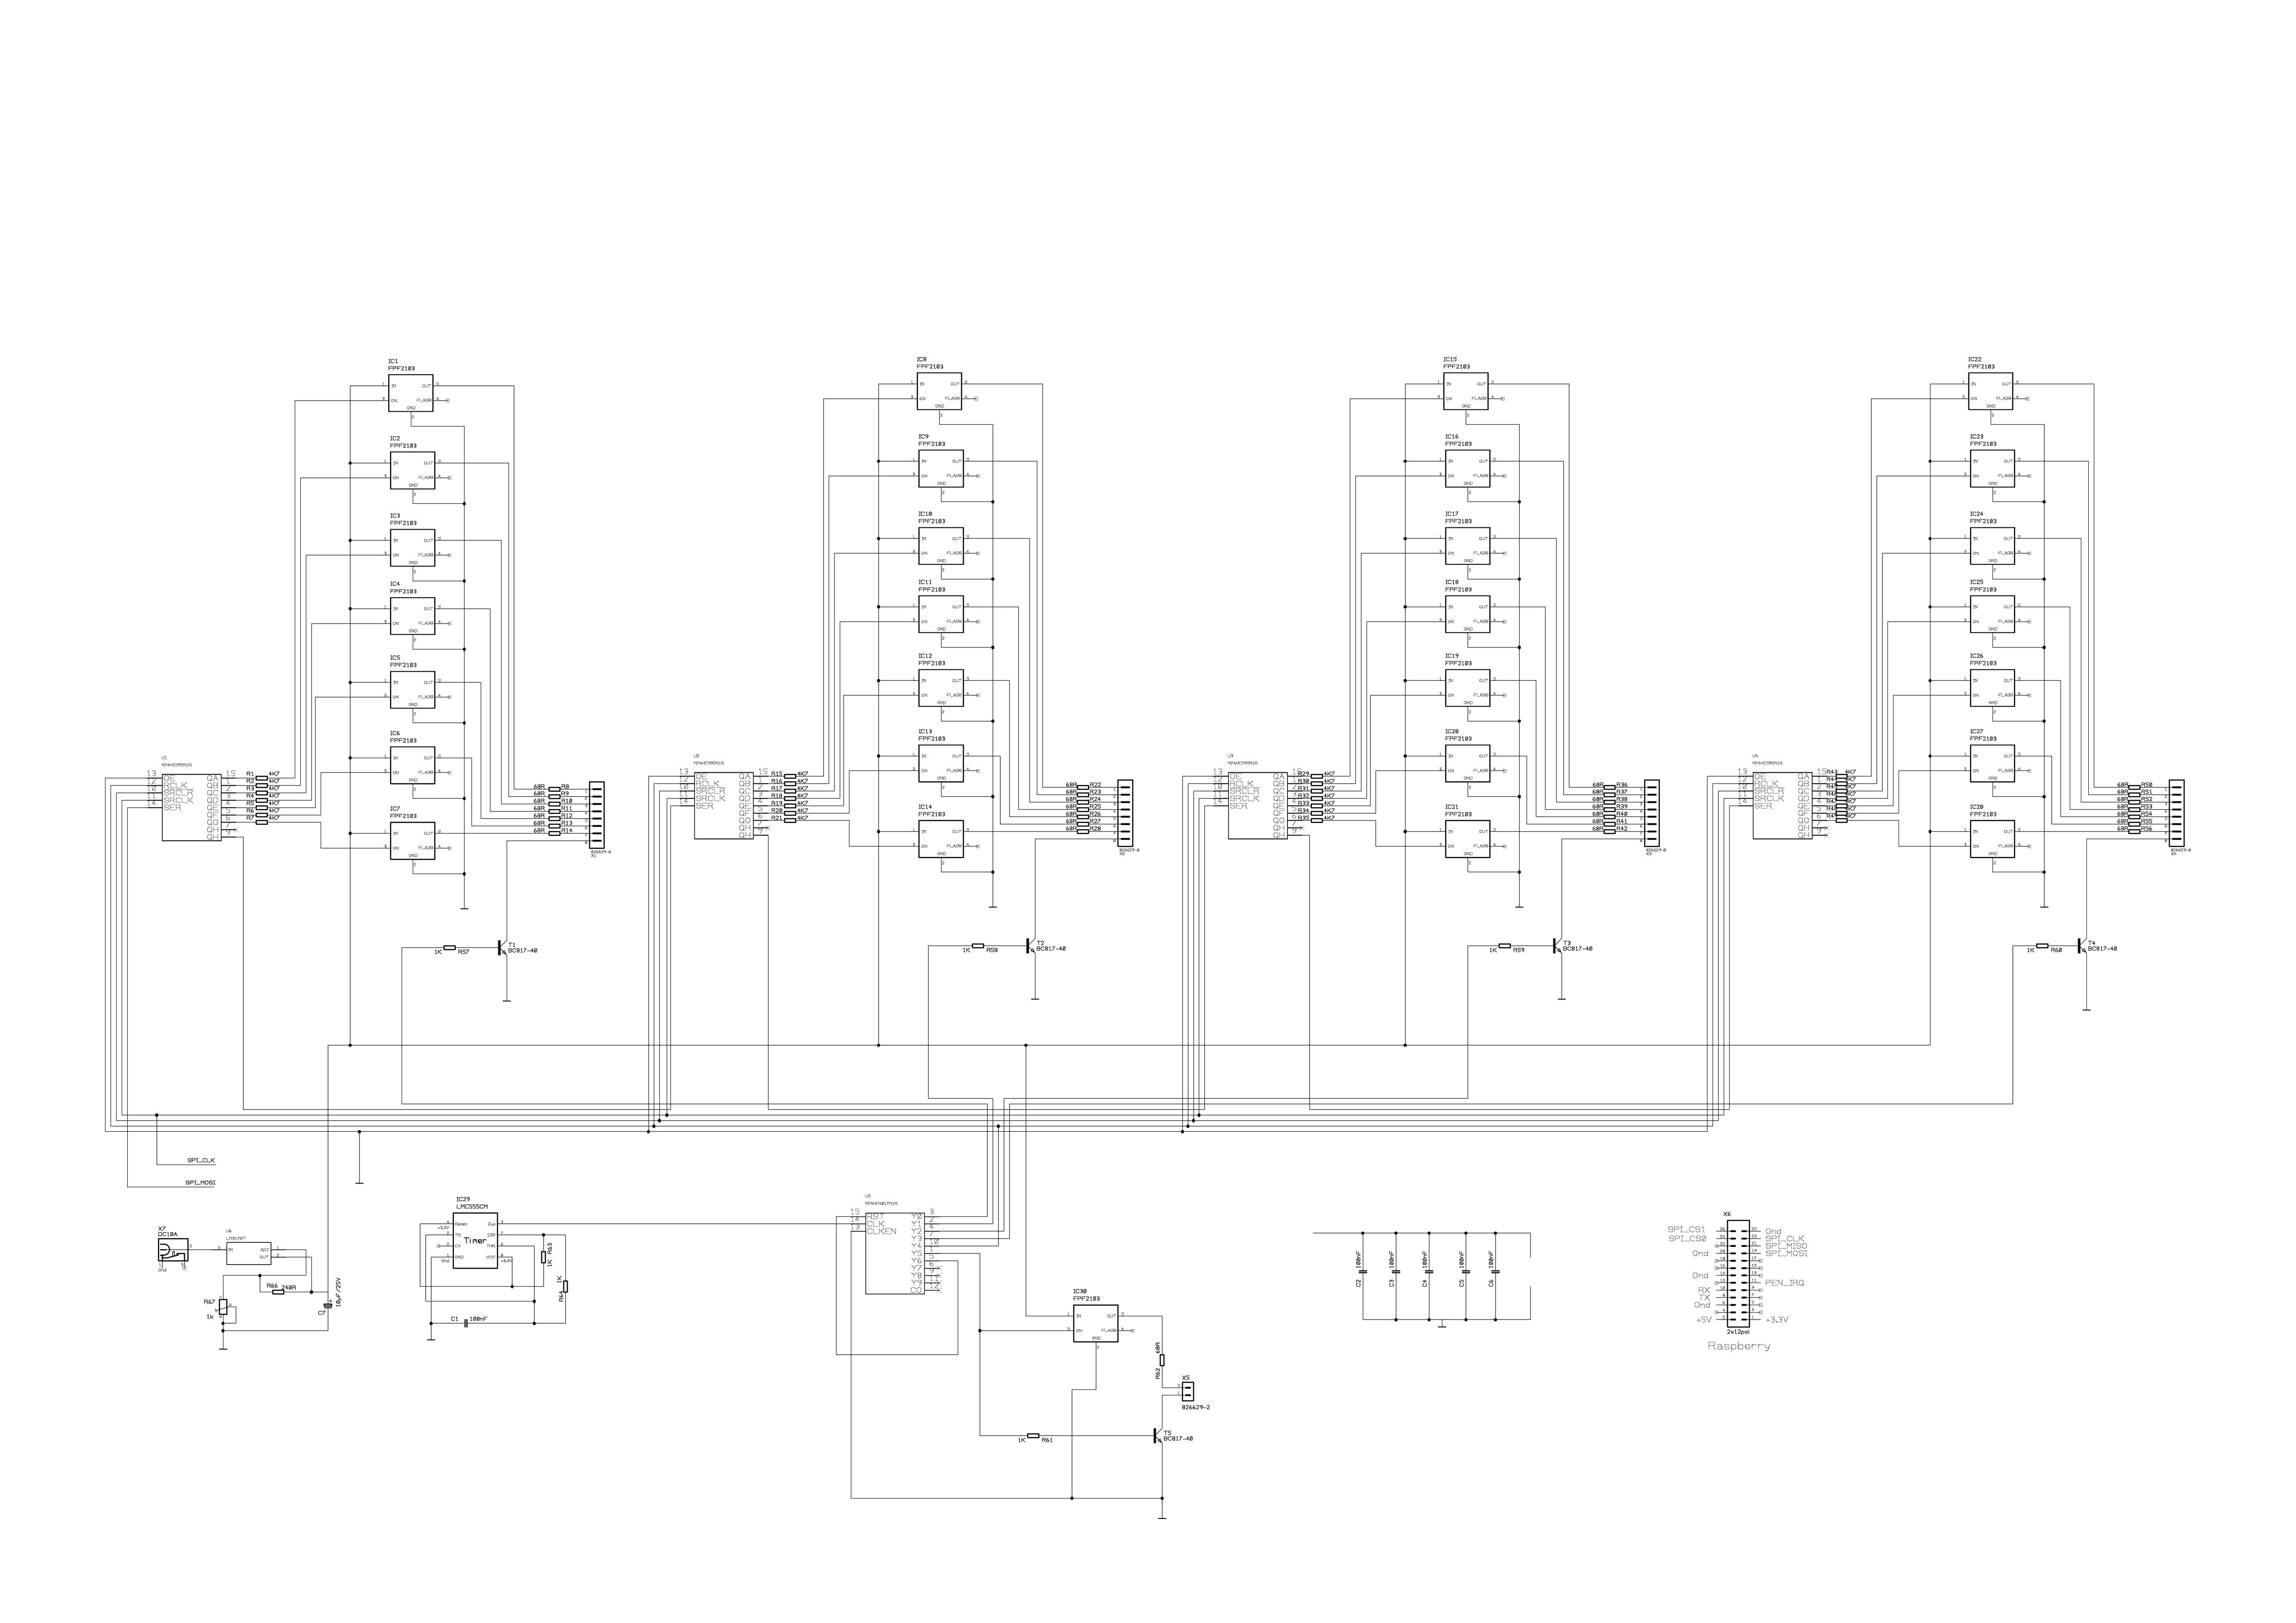 Großartig Leseschaltplan Galerie - Elektrische Schaltplan-Ideen ...